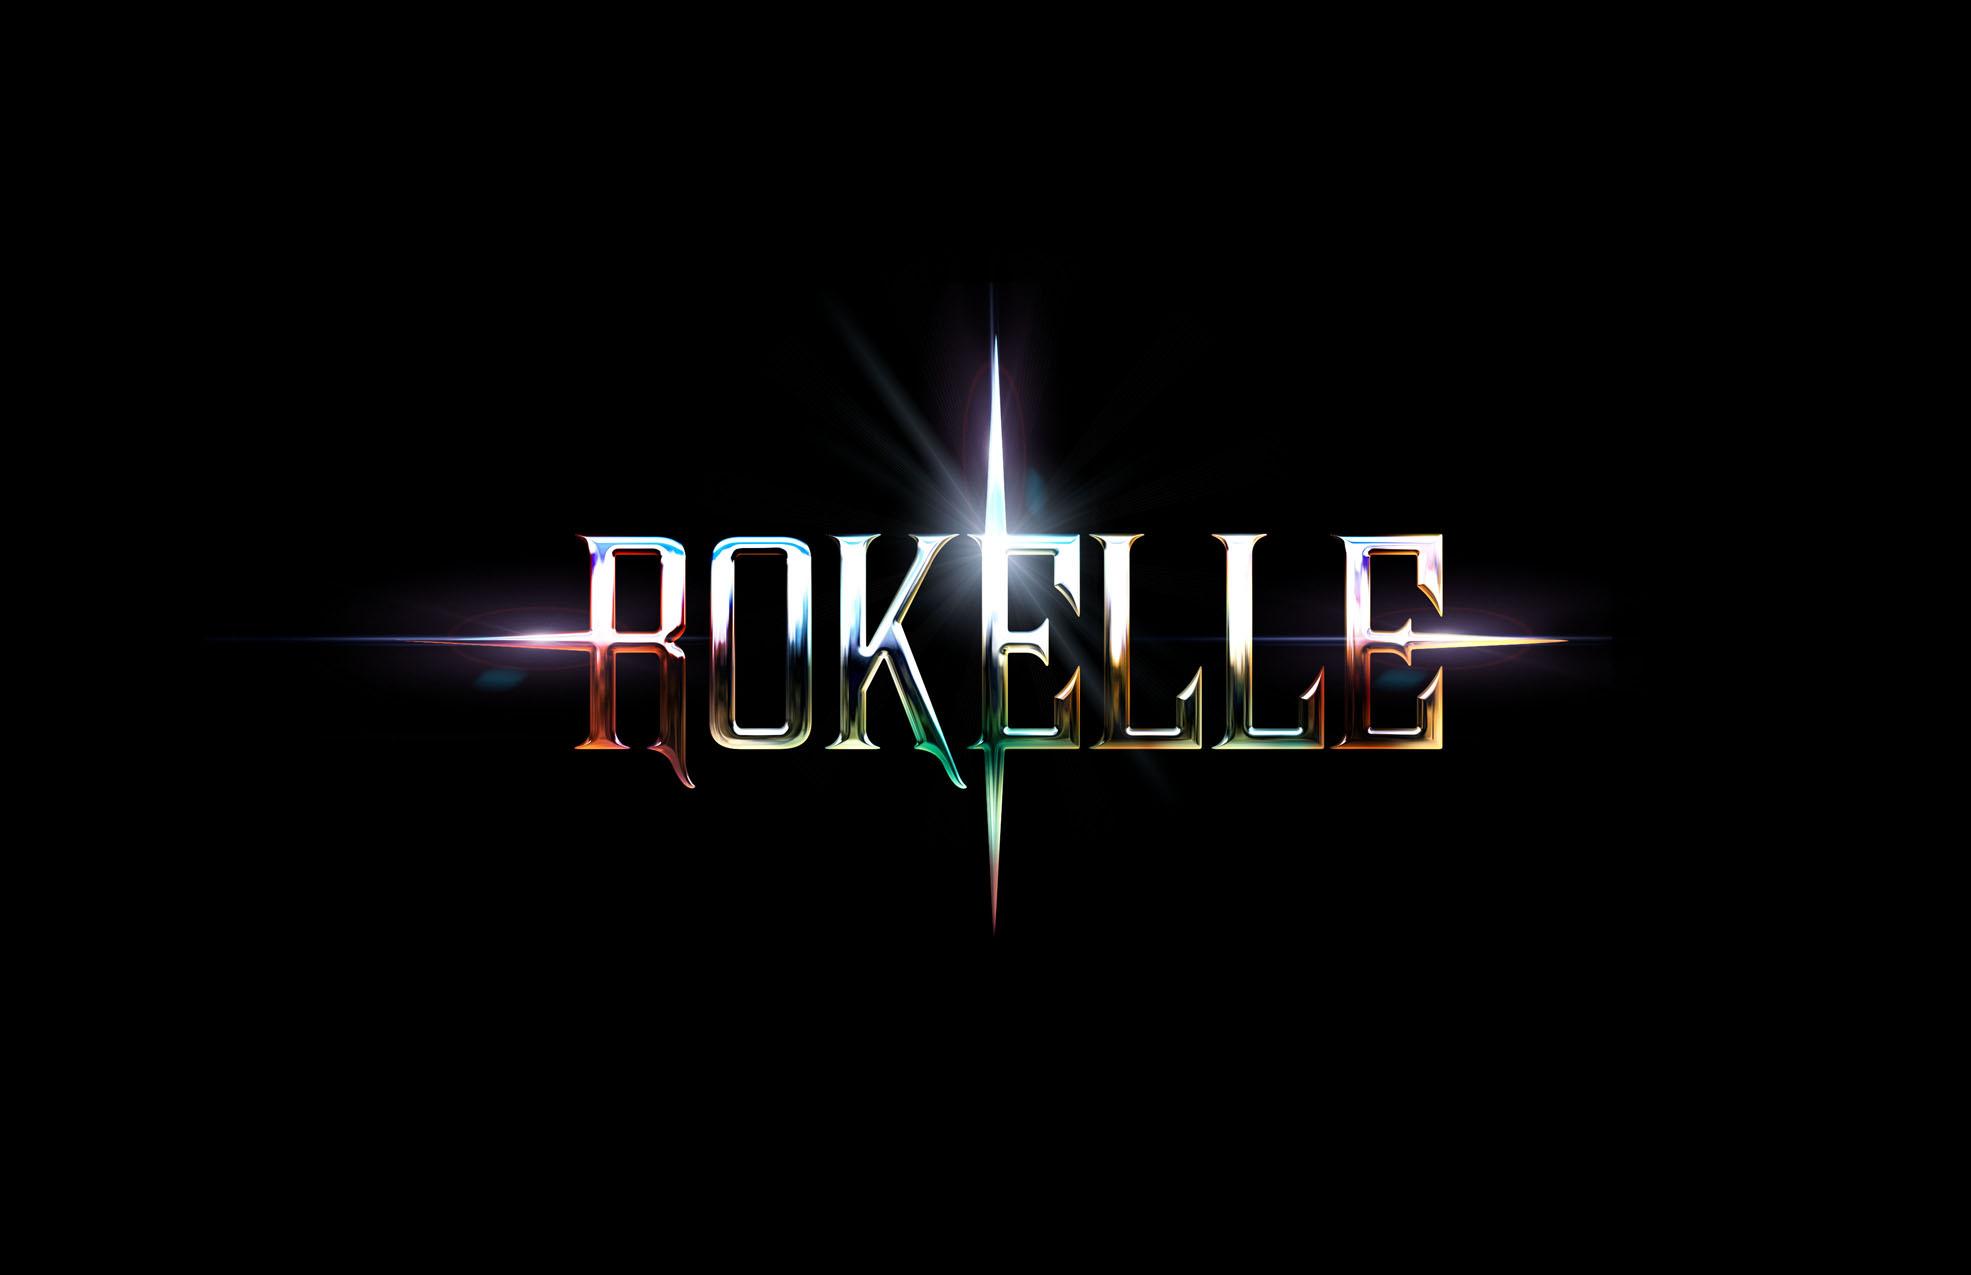 4-ROKELLE_LOGO_COMP1B.jpg